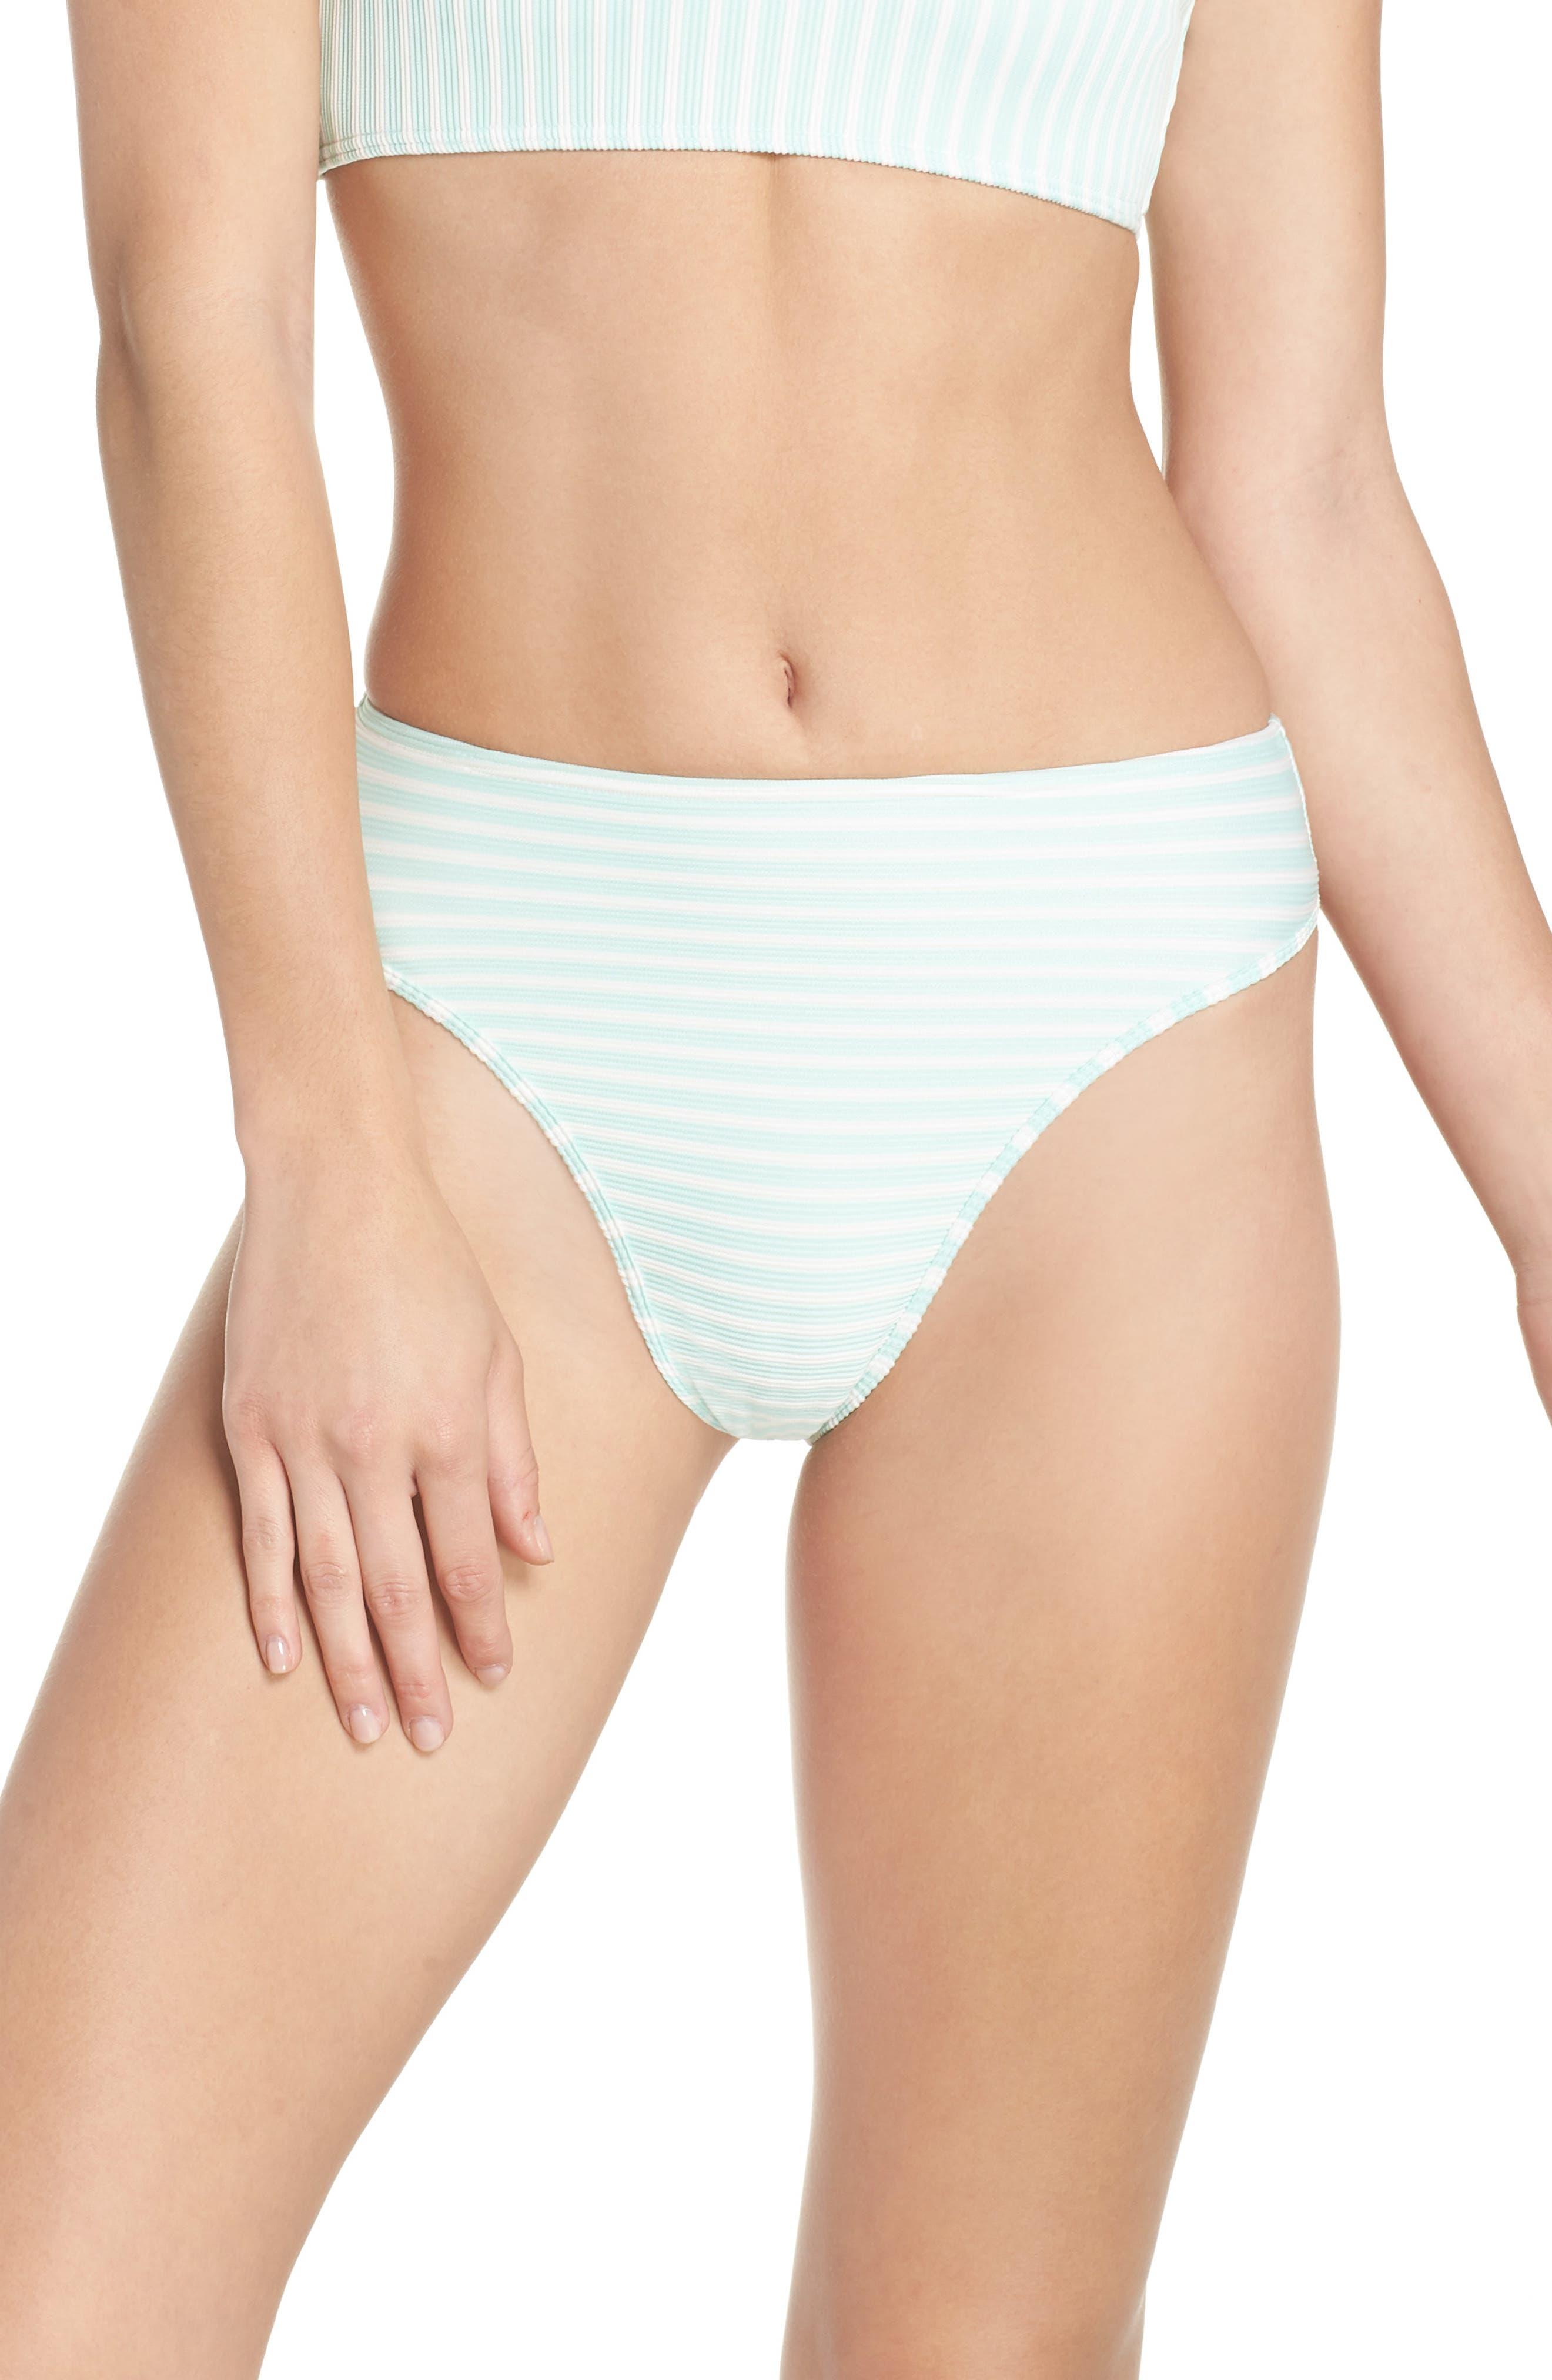 Pierre High Waist Bikini Bottoms,                             Main thumbnail 1, color,                             Spearmint